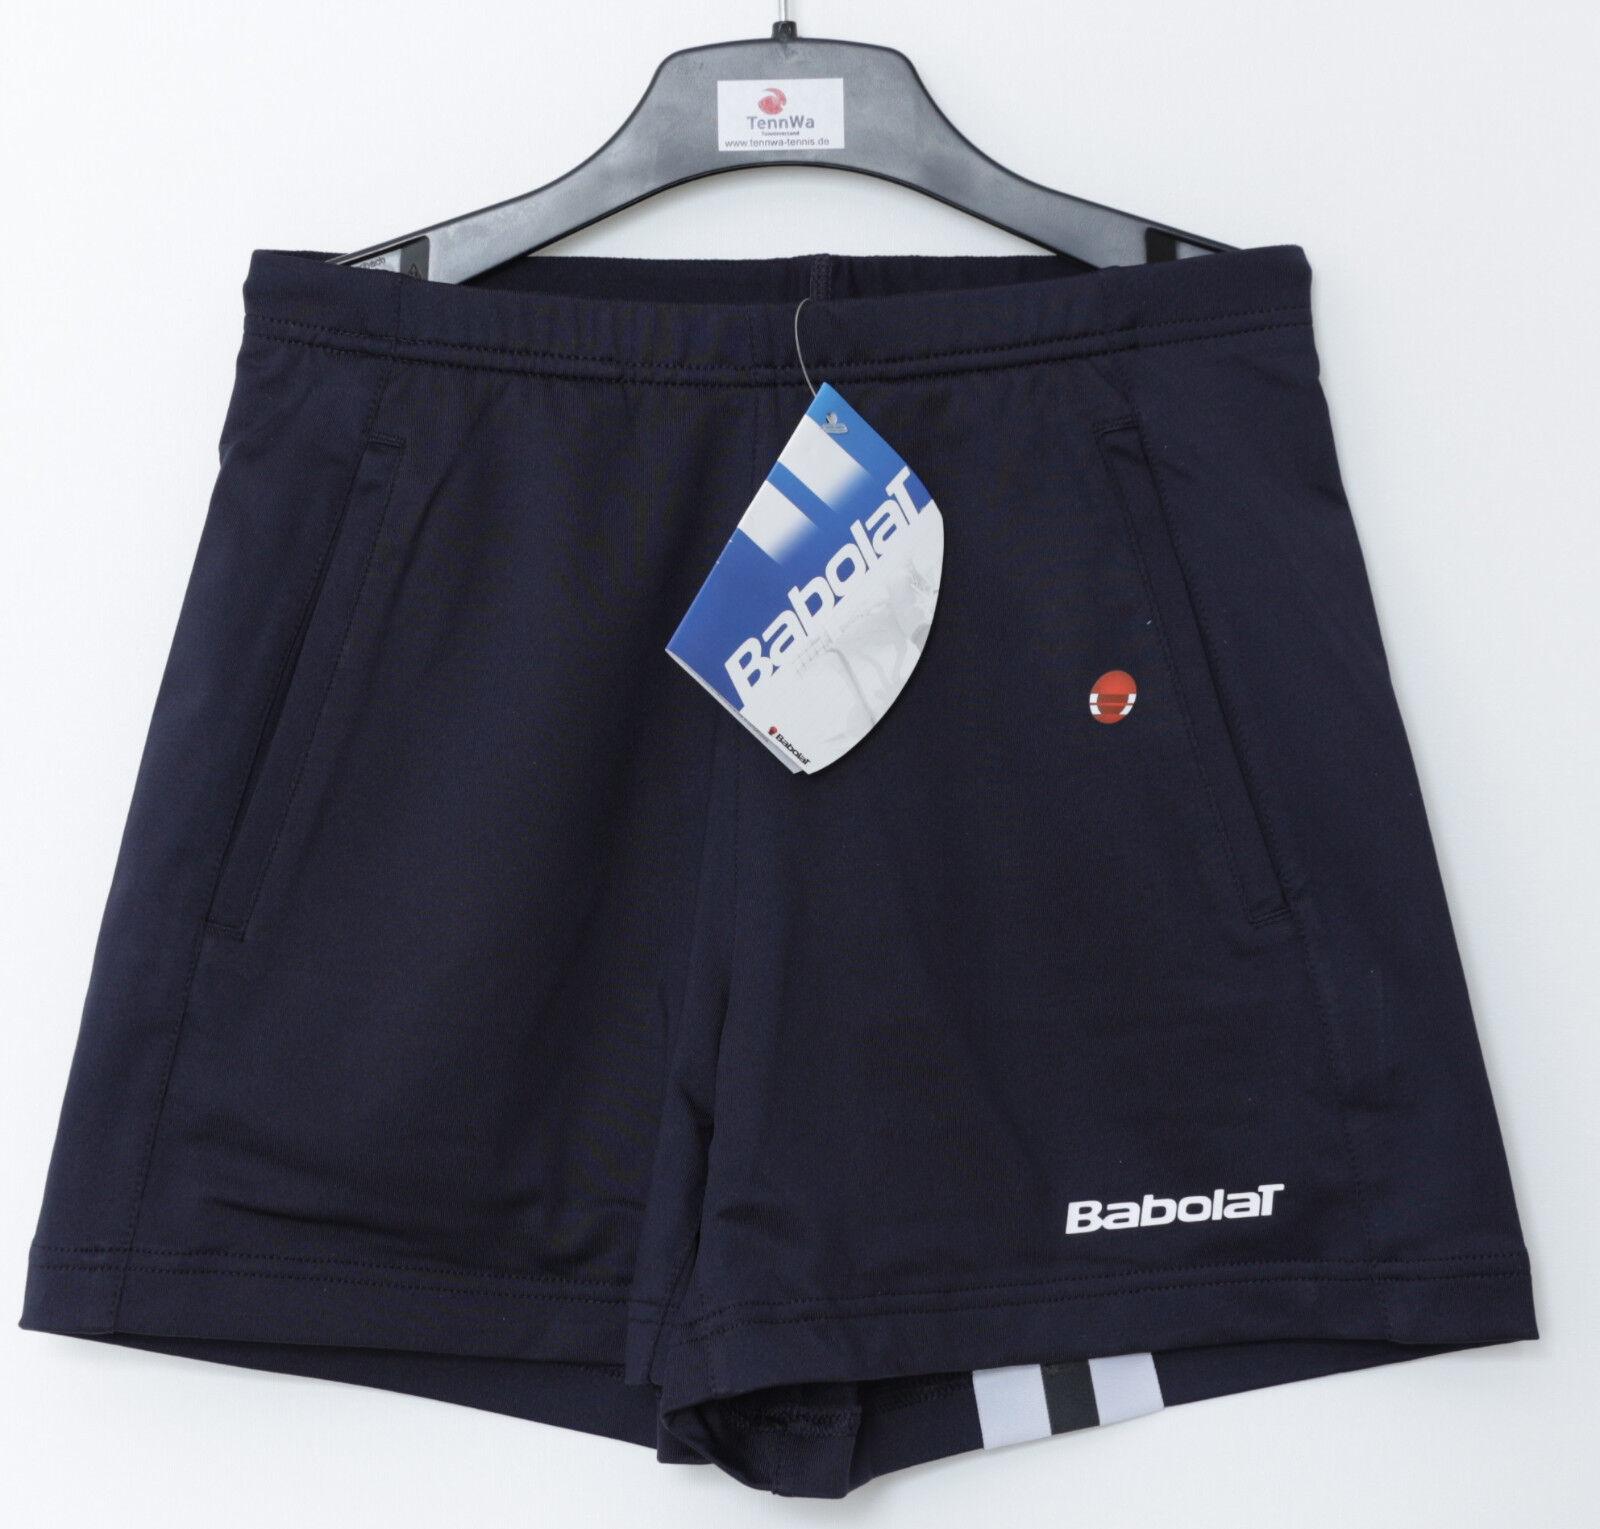 MEGASALE: Babolat Damen Club Short dunkelblau, statt 34,95€*, kurze Hose Tennis